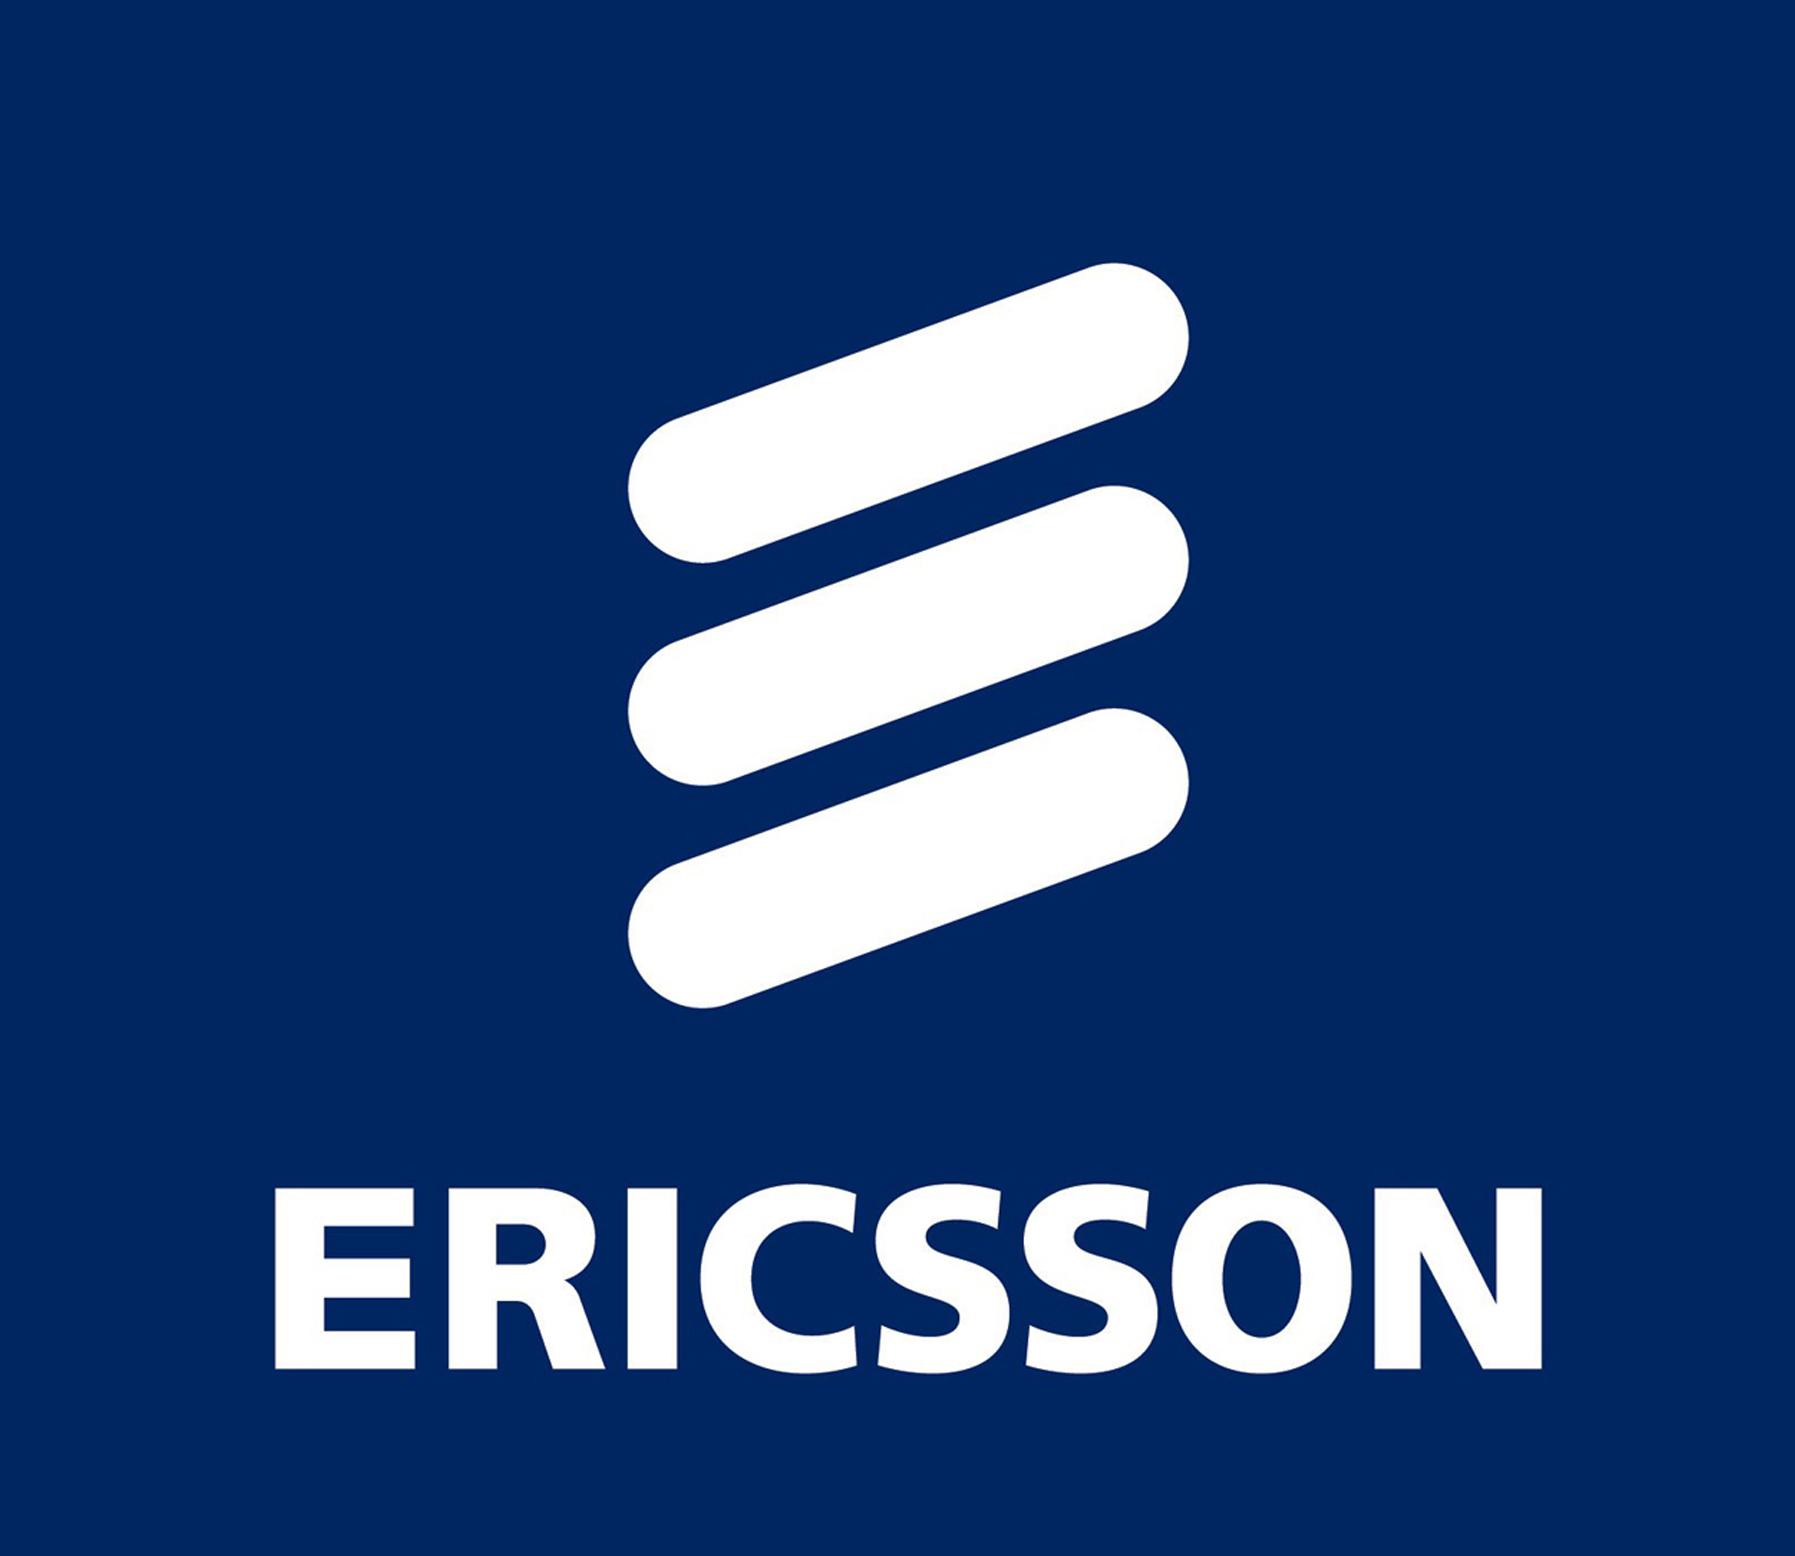 Ericsson - Mobile World Congress (MWC)